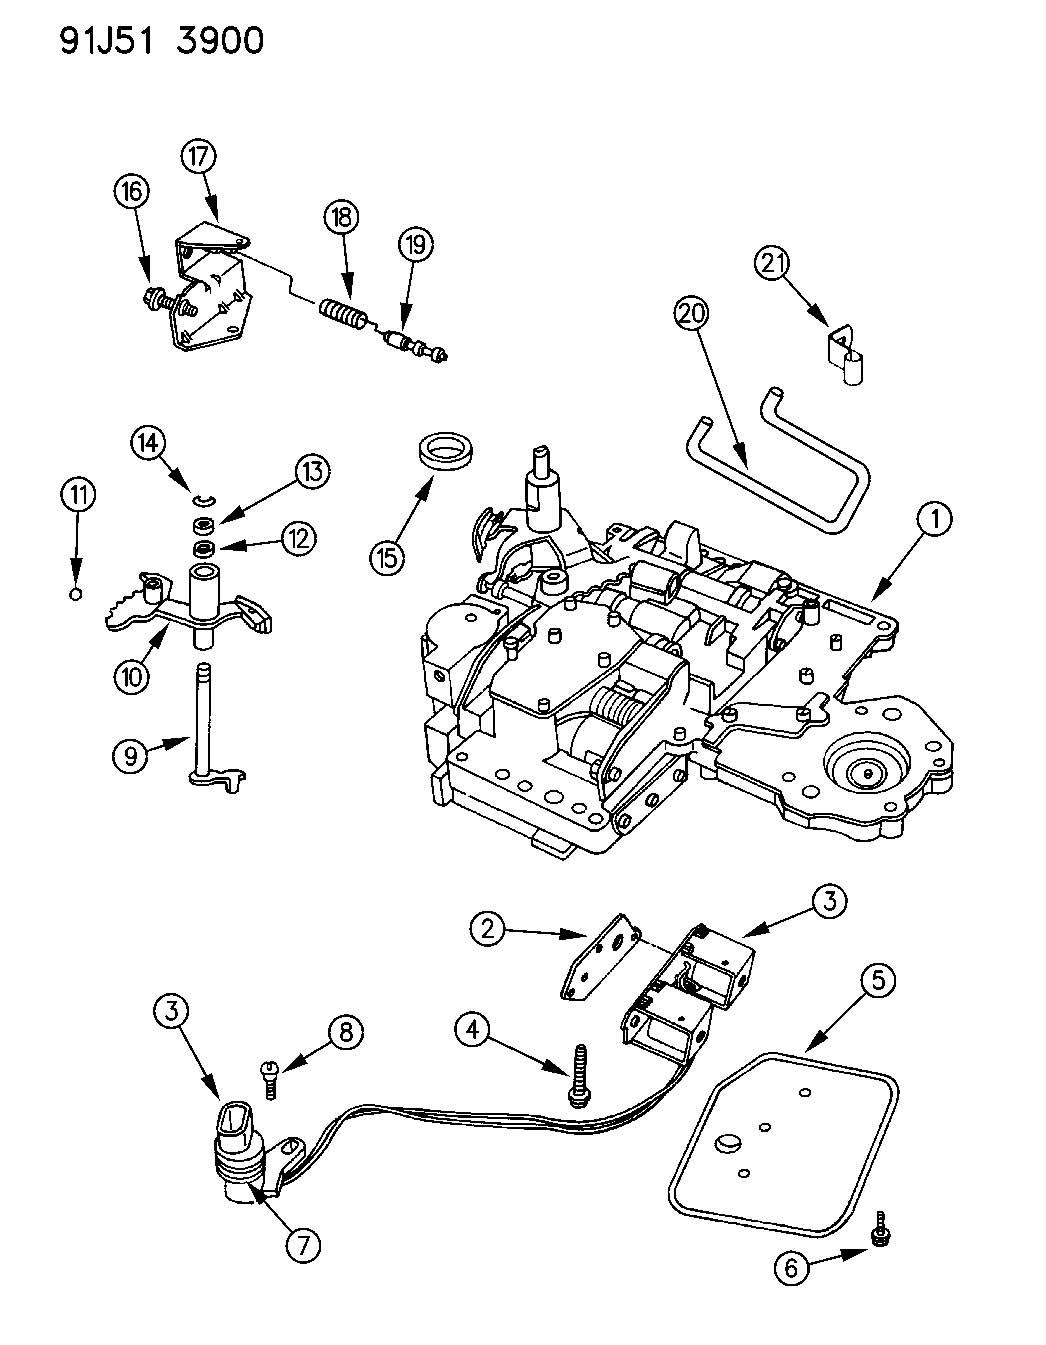 46re Transmission Parts Diagram : transmission, parts, diagram, ET_5260], Transmission, Parts, Diagram, Wiring